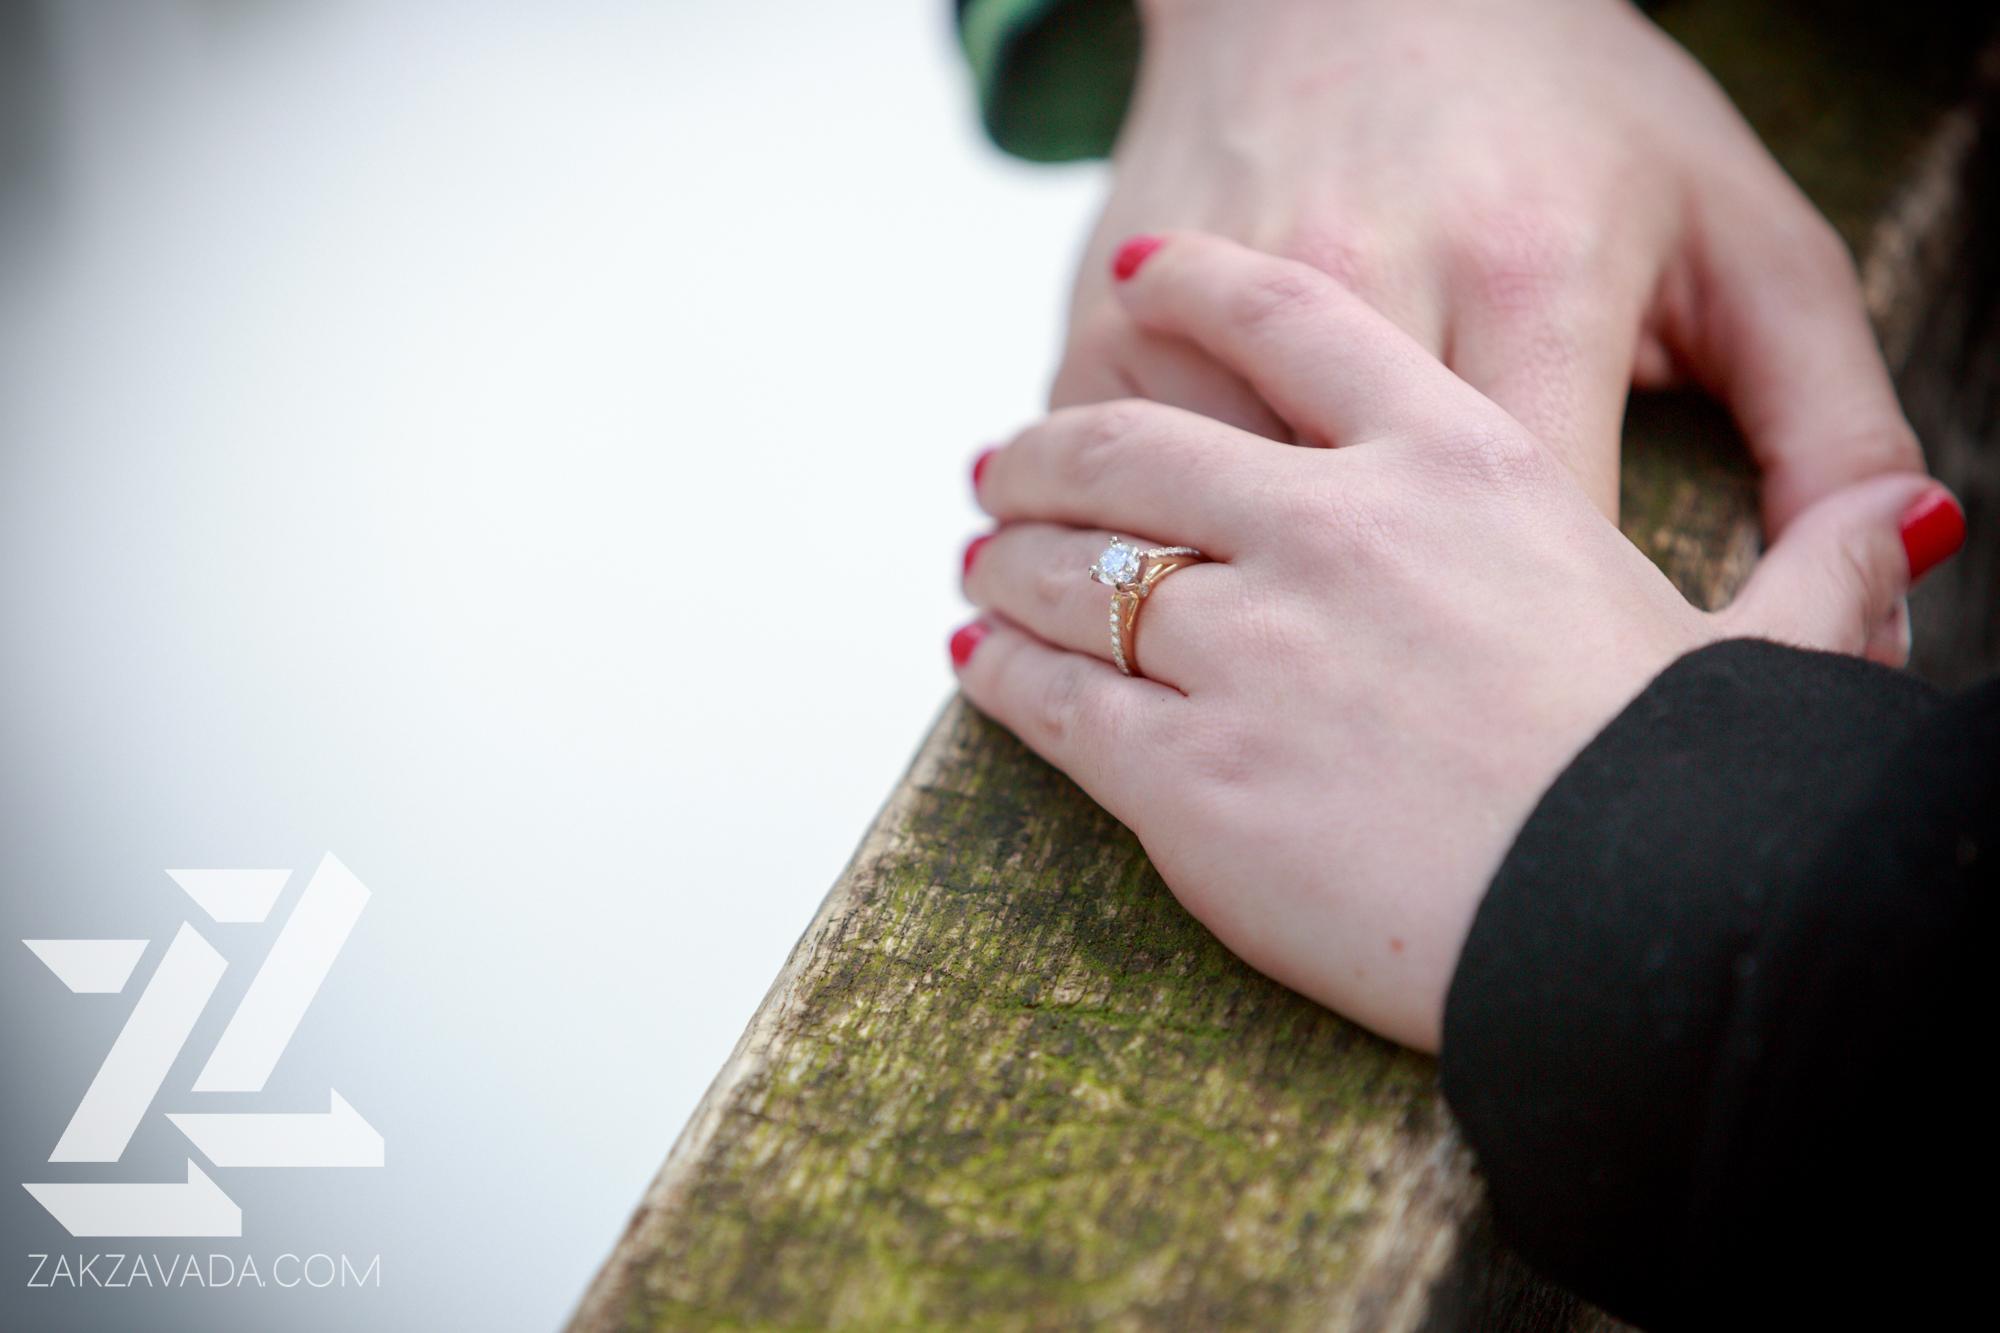 scranton-wedding-photography-zak-zavada-2015.03-mariDustinEngagement-2015-6.jpg